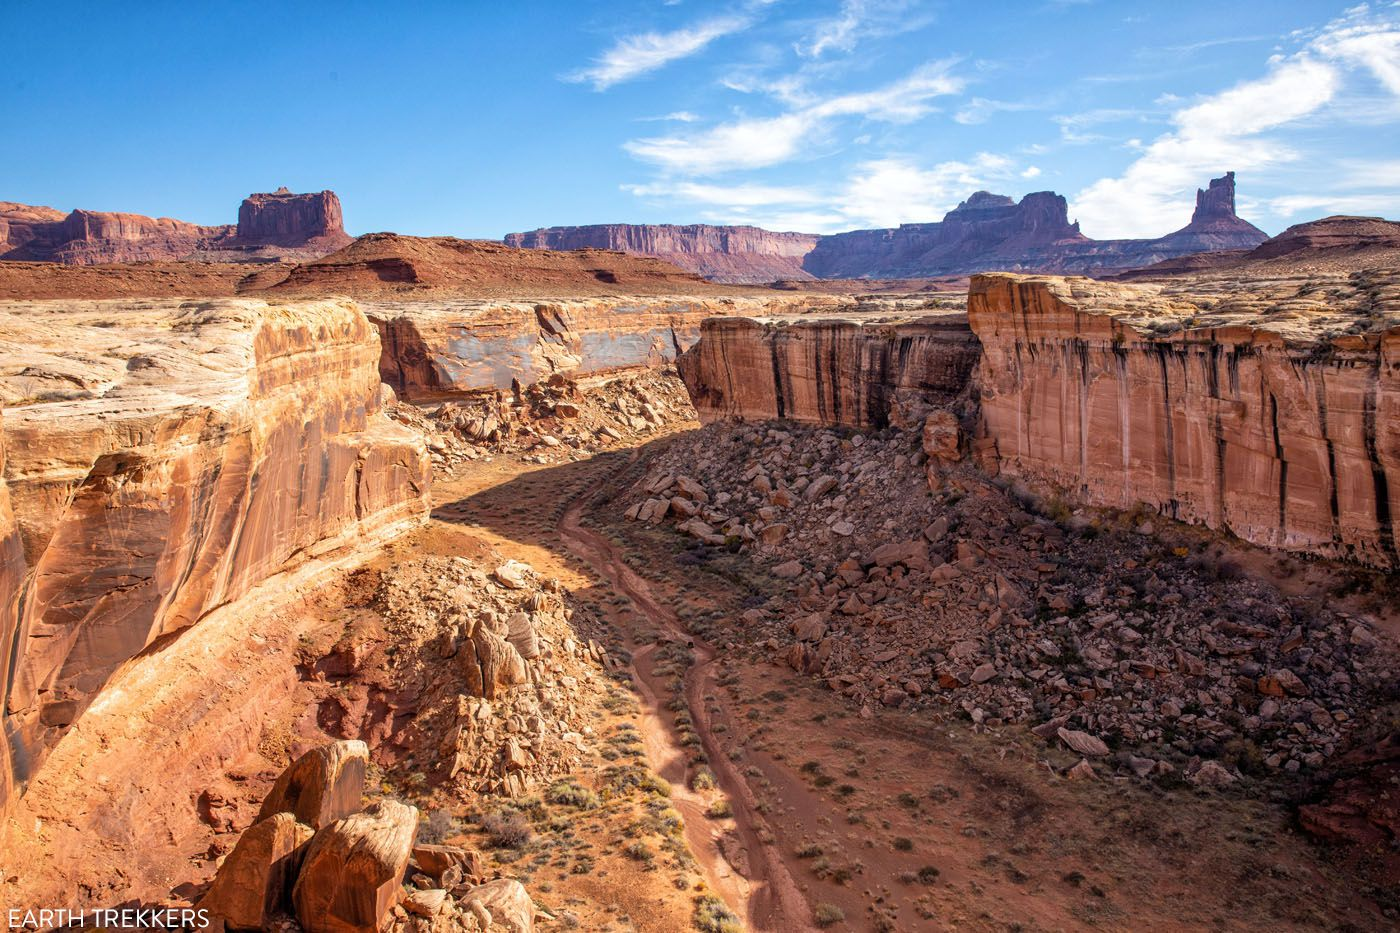 Holeman Canyon